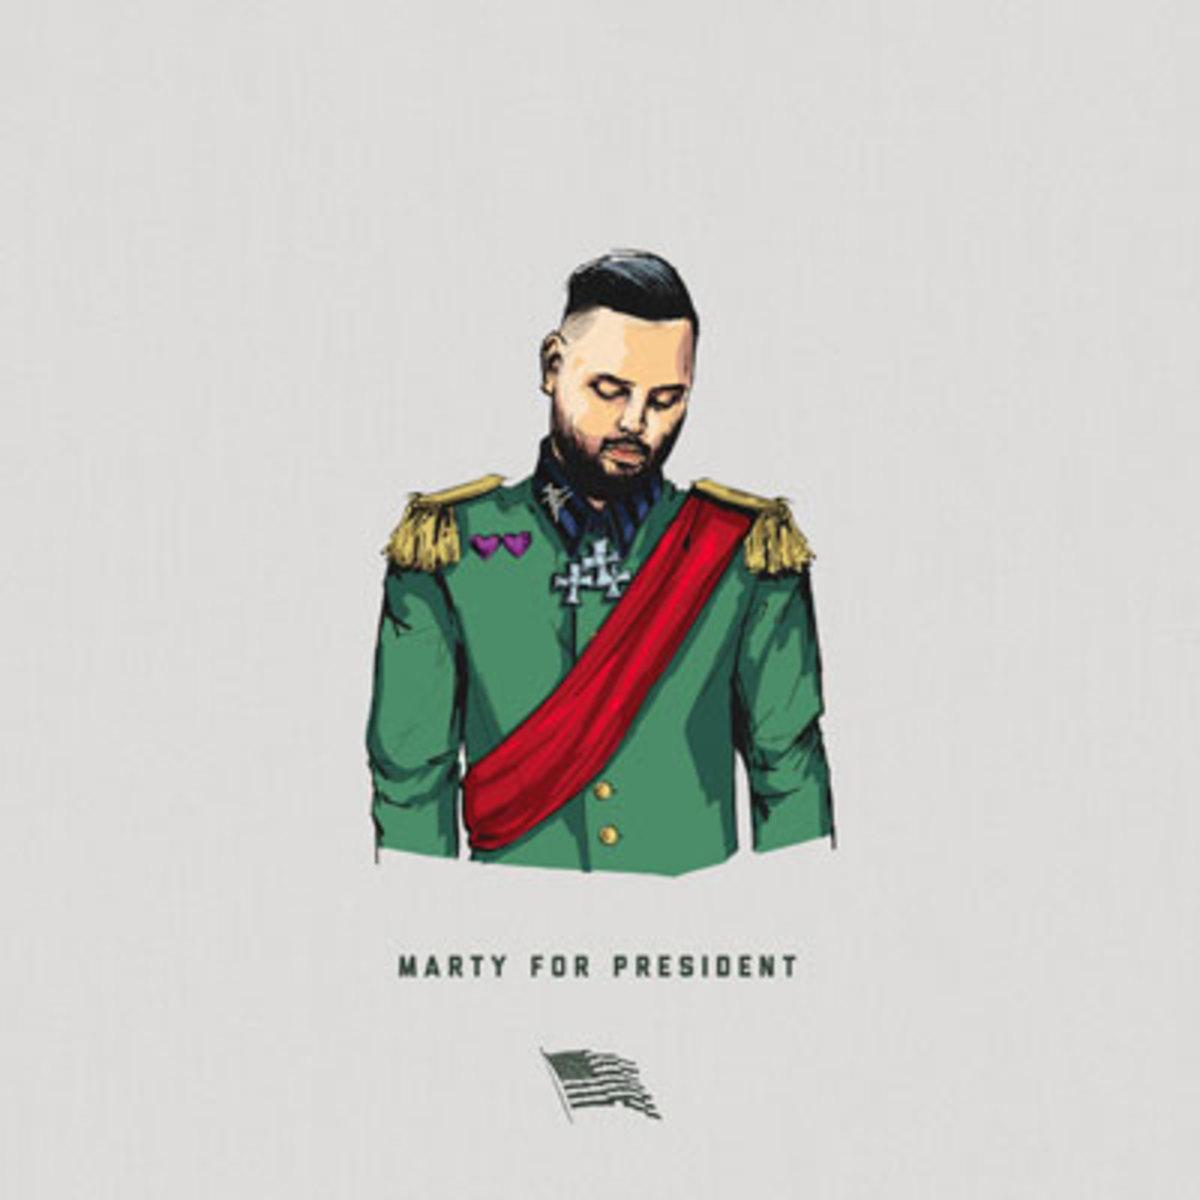 marty-marty-for-president.jpg